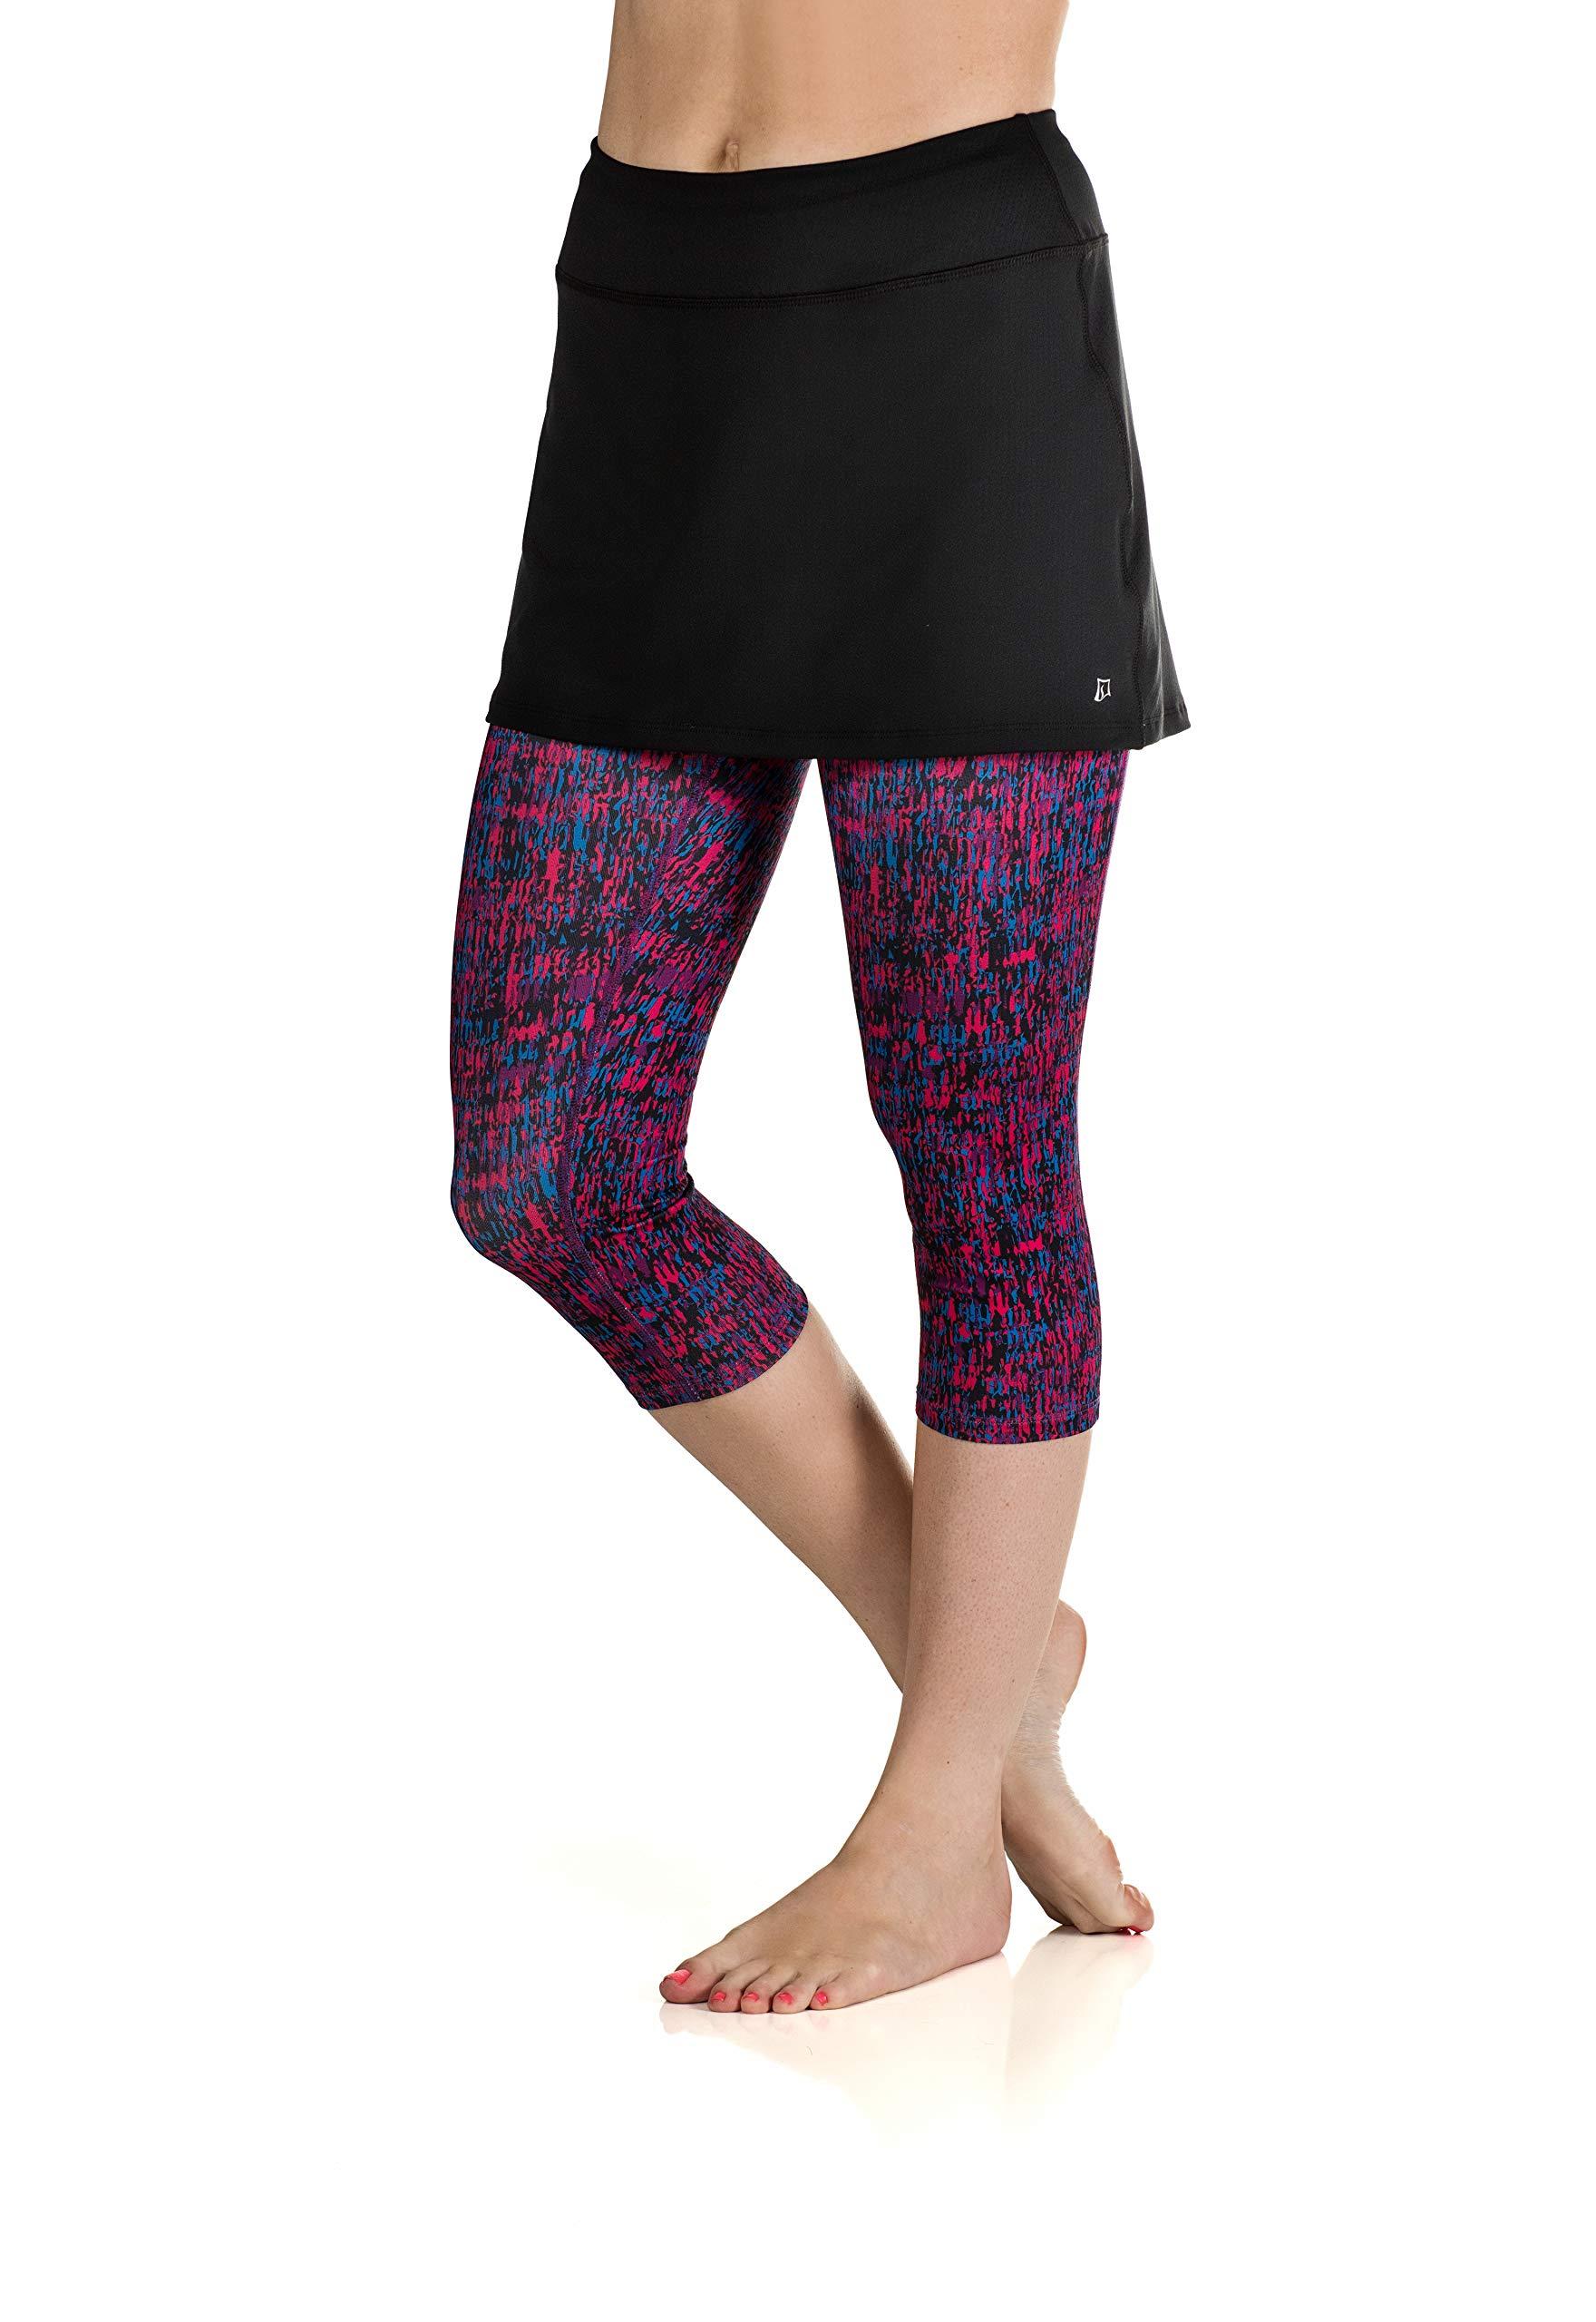 Skirt Sports Women's Lotta Breeze Capri Skirt, Black/Chaos Print, X-Small by Skirt Sports